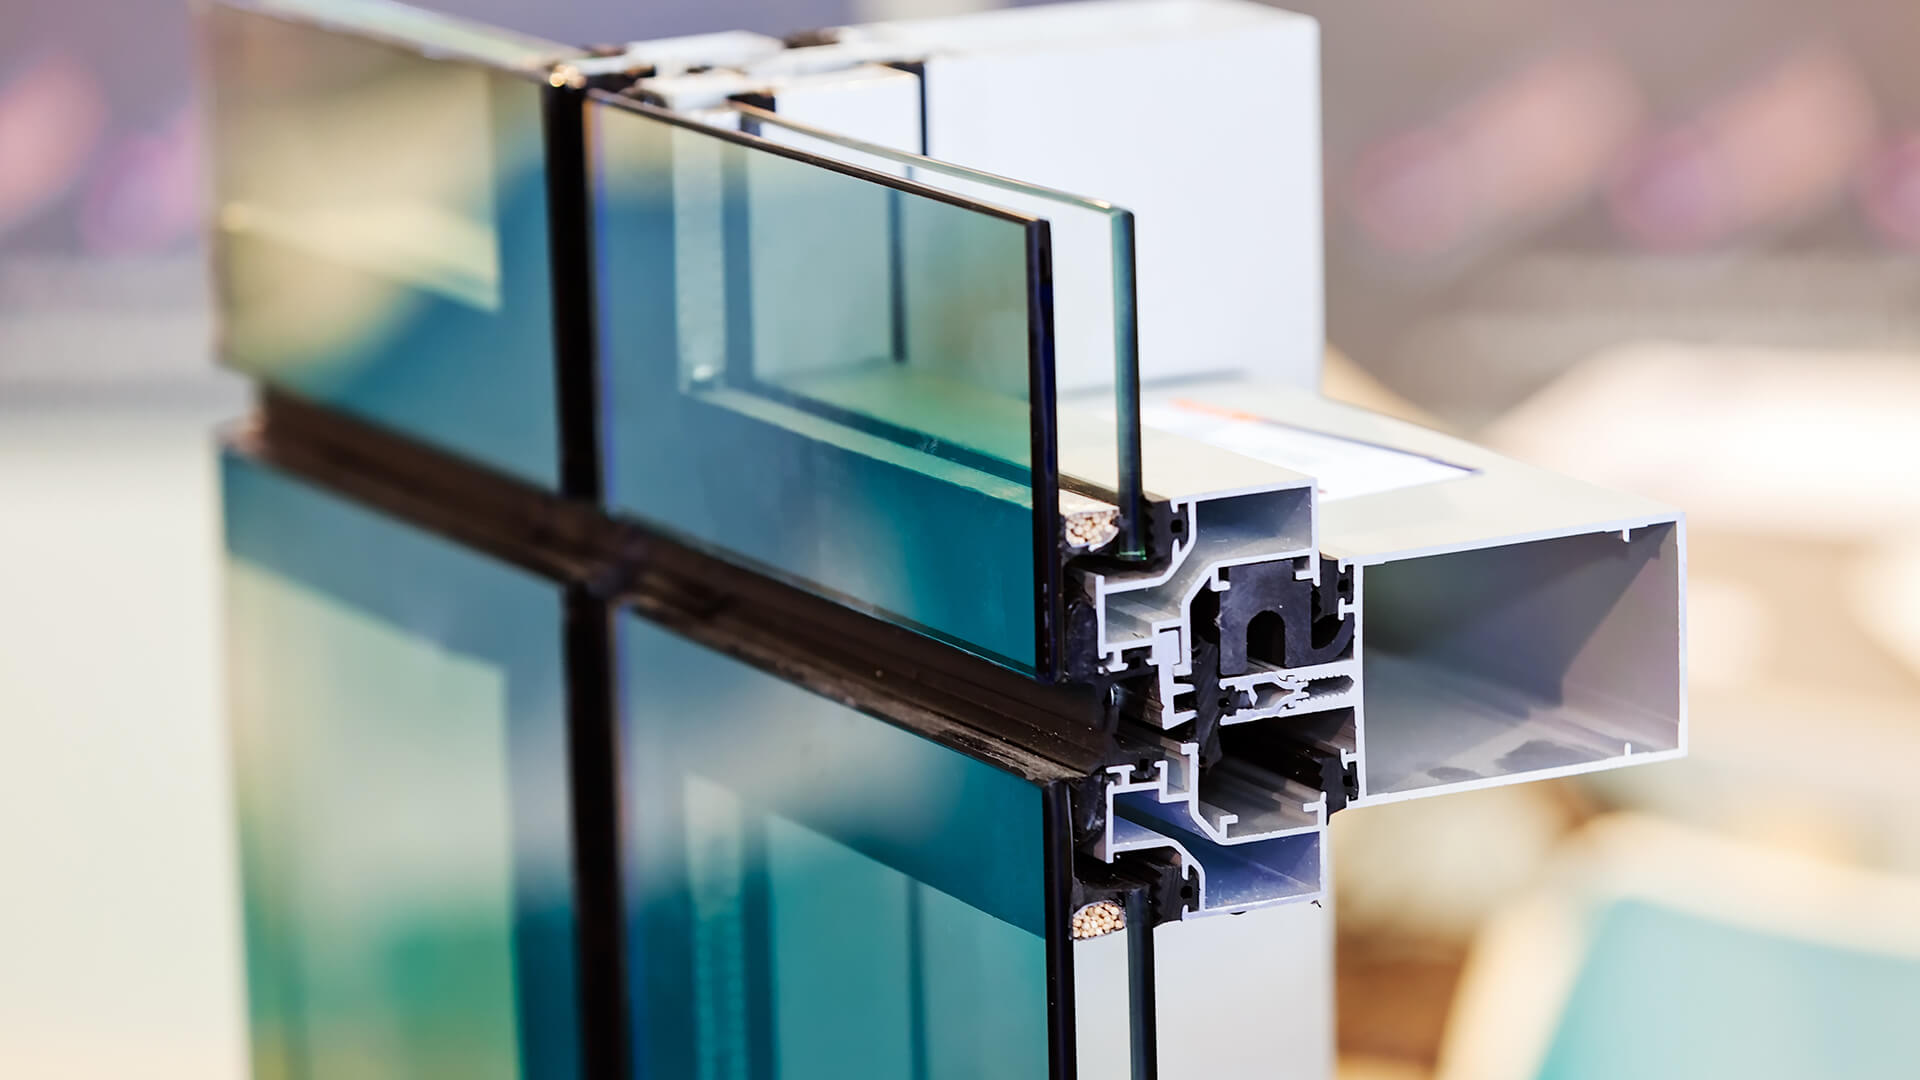 pencere cam tamiri - Üretim, Satış, Montaj Hizmetleri